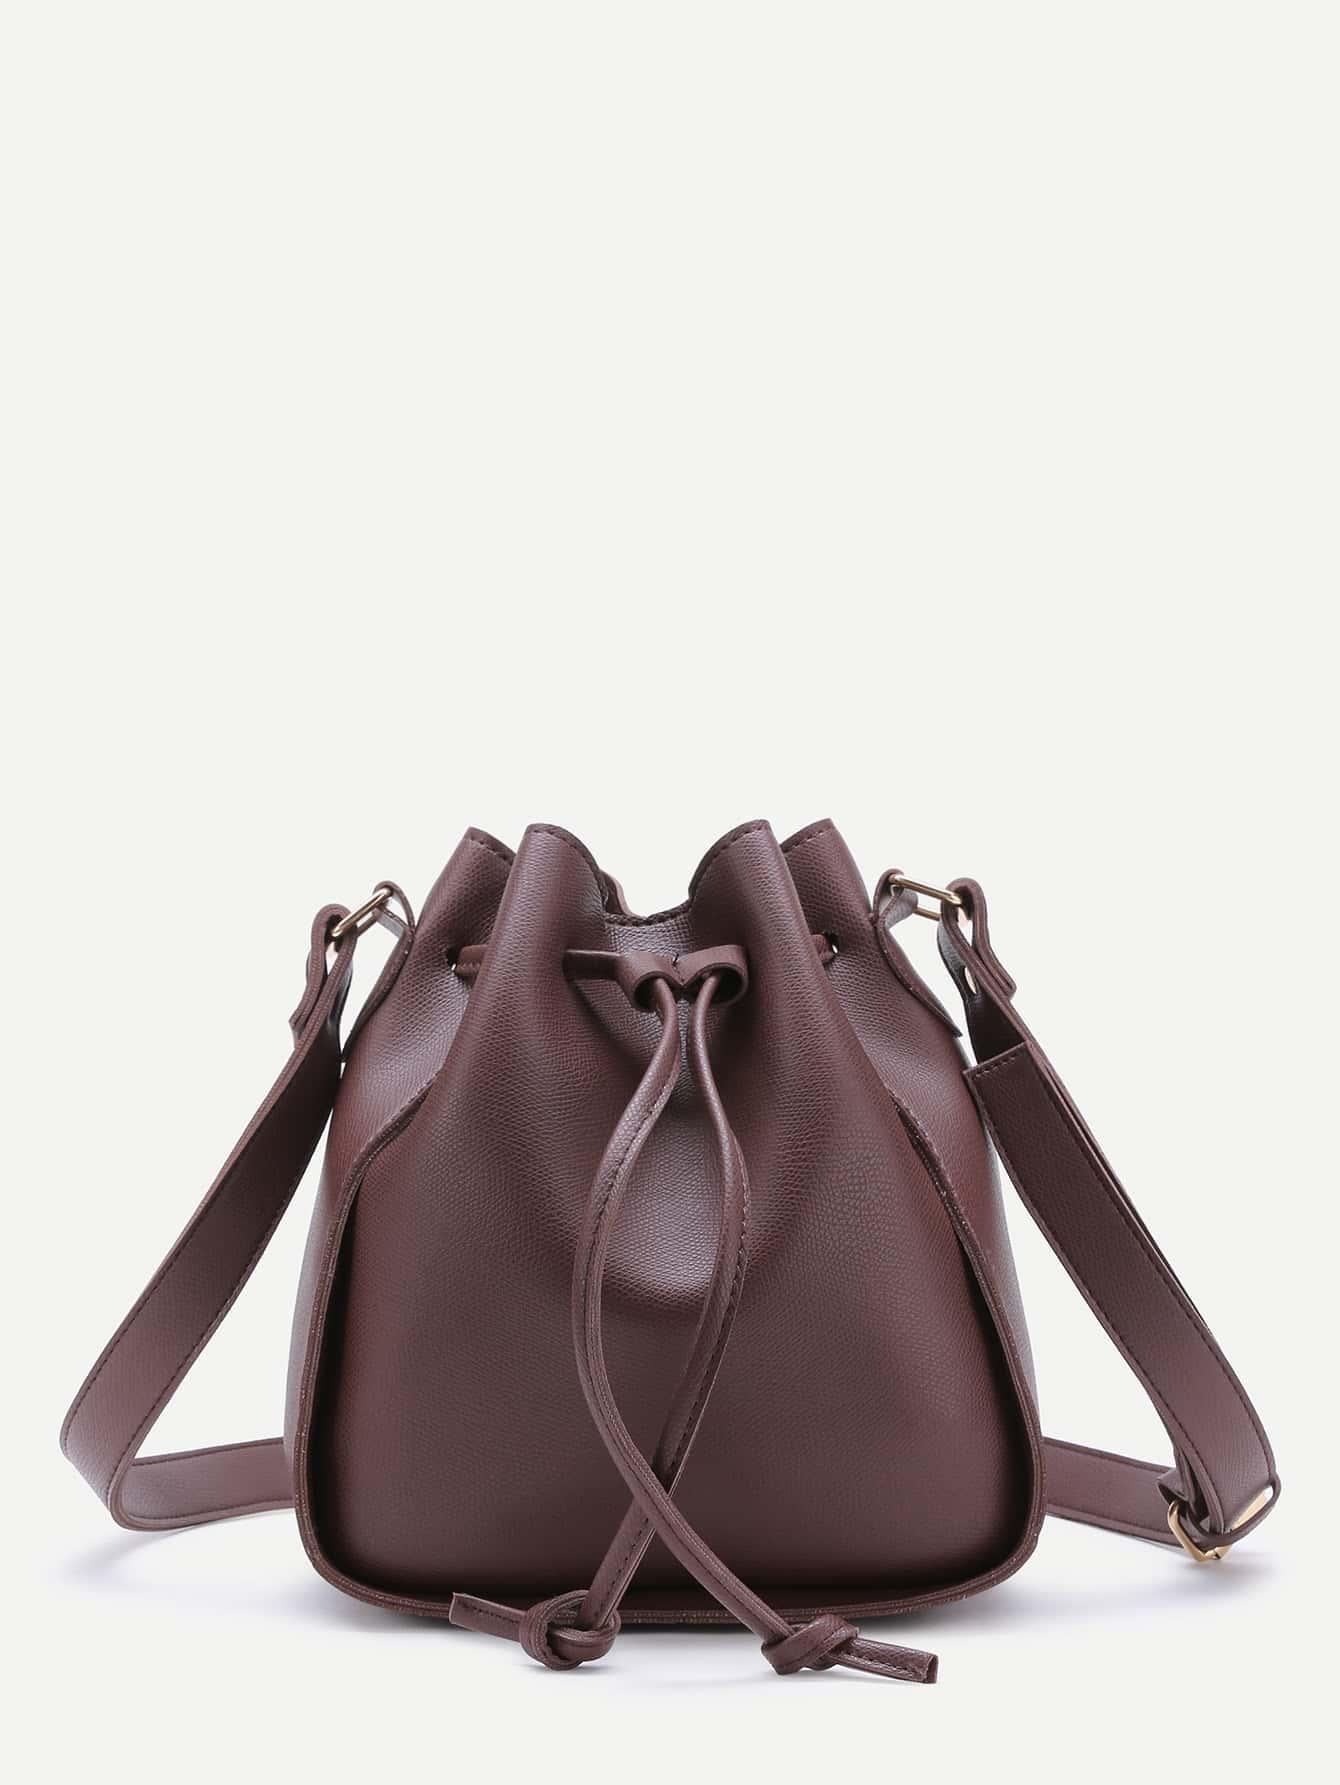 bag170504906_2